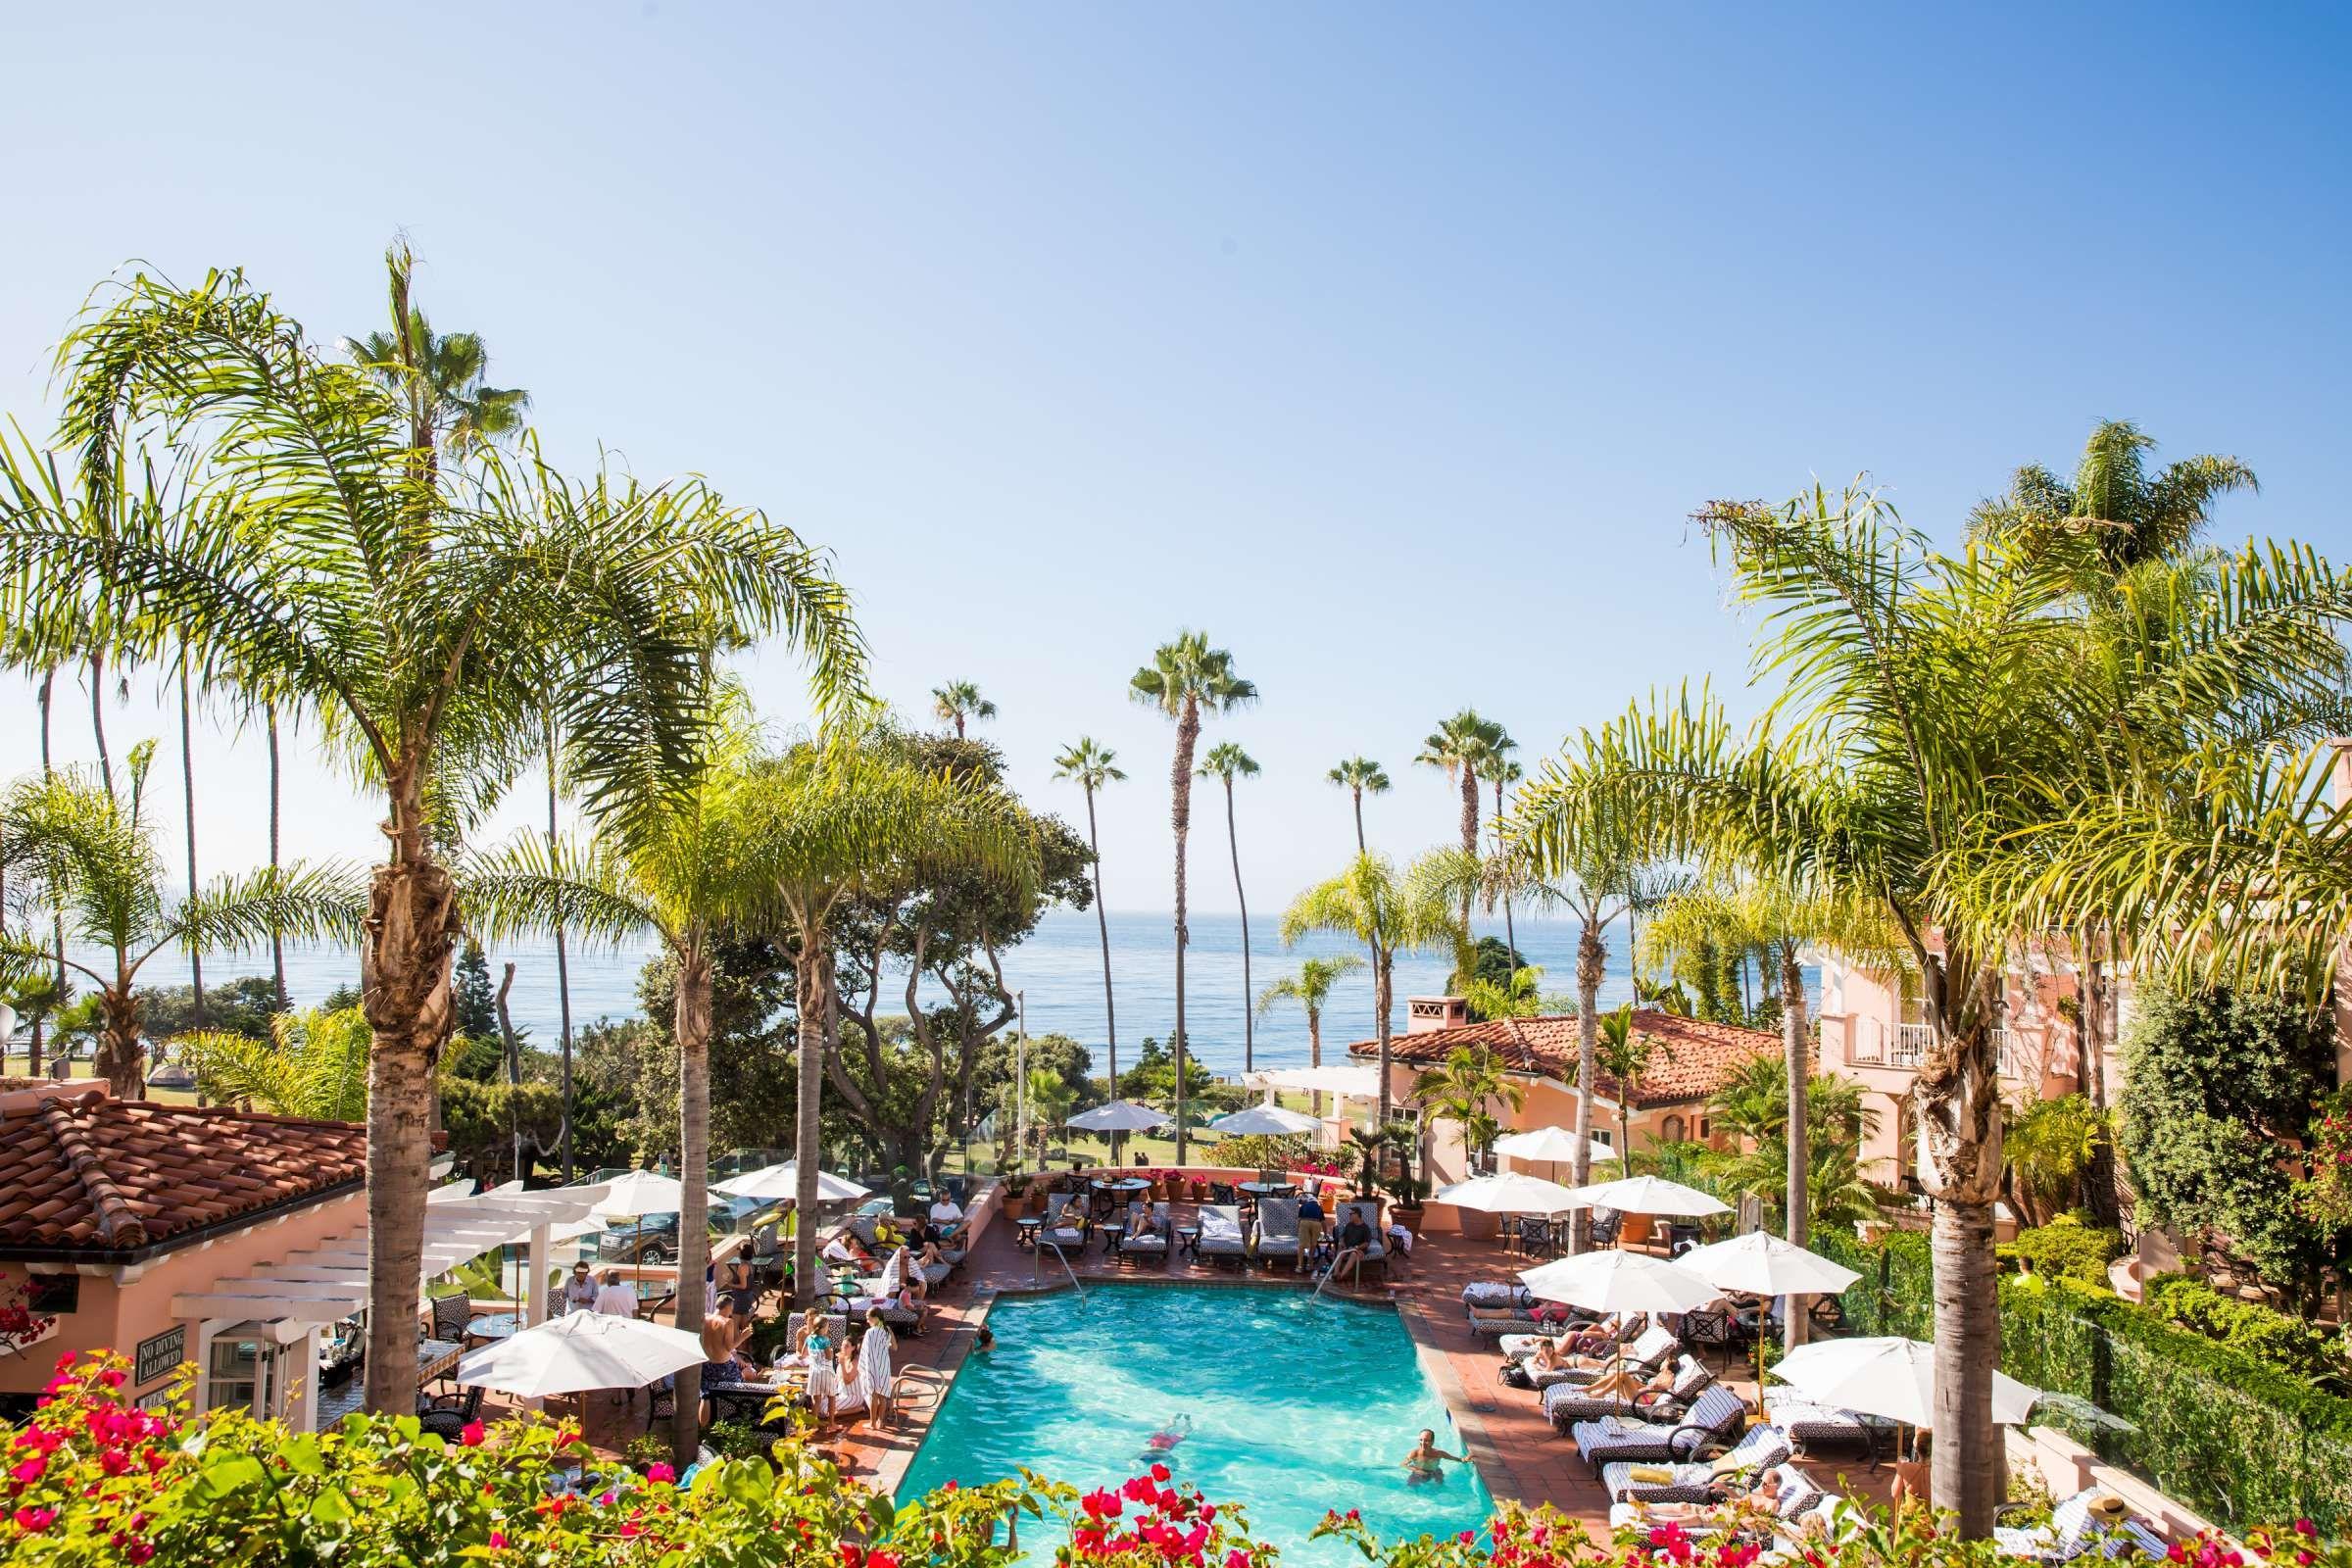 Pool With An Ocean View La Valencia Hotel La Jolla Ca La Valencia Hotel La Jolla Hotels San Diego Hotels